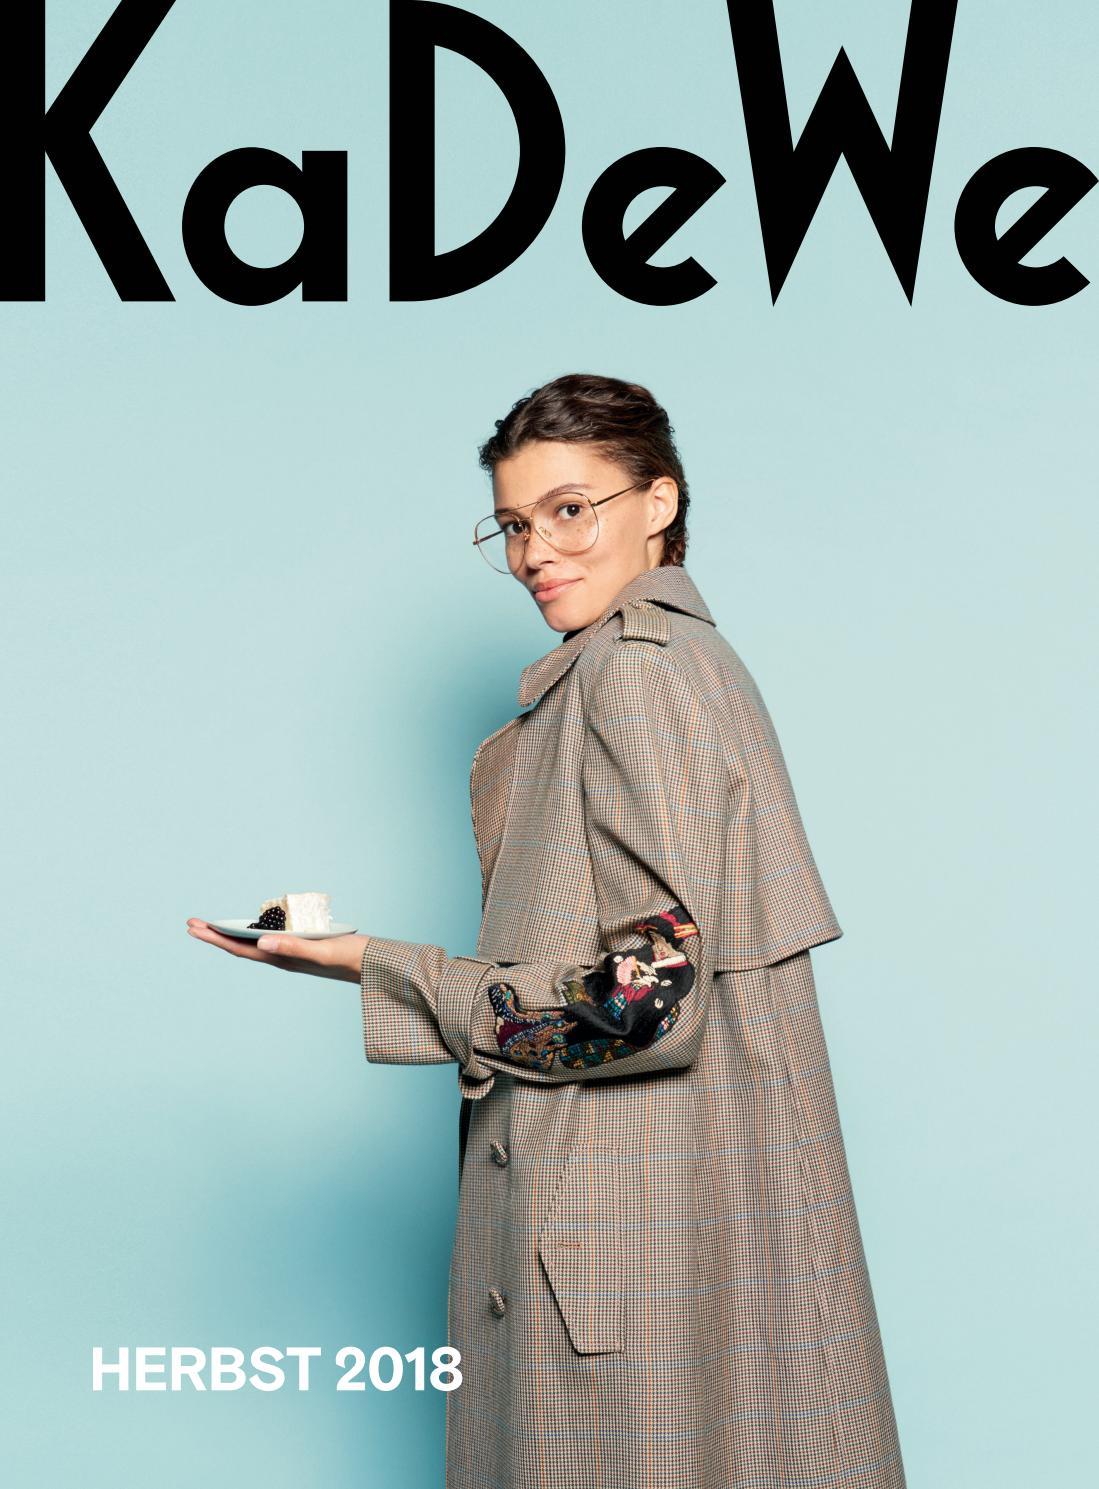 Women 2018 Berlin Herbst By Kadewe Issuu deWrxoBC